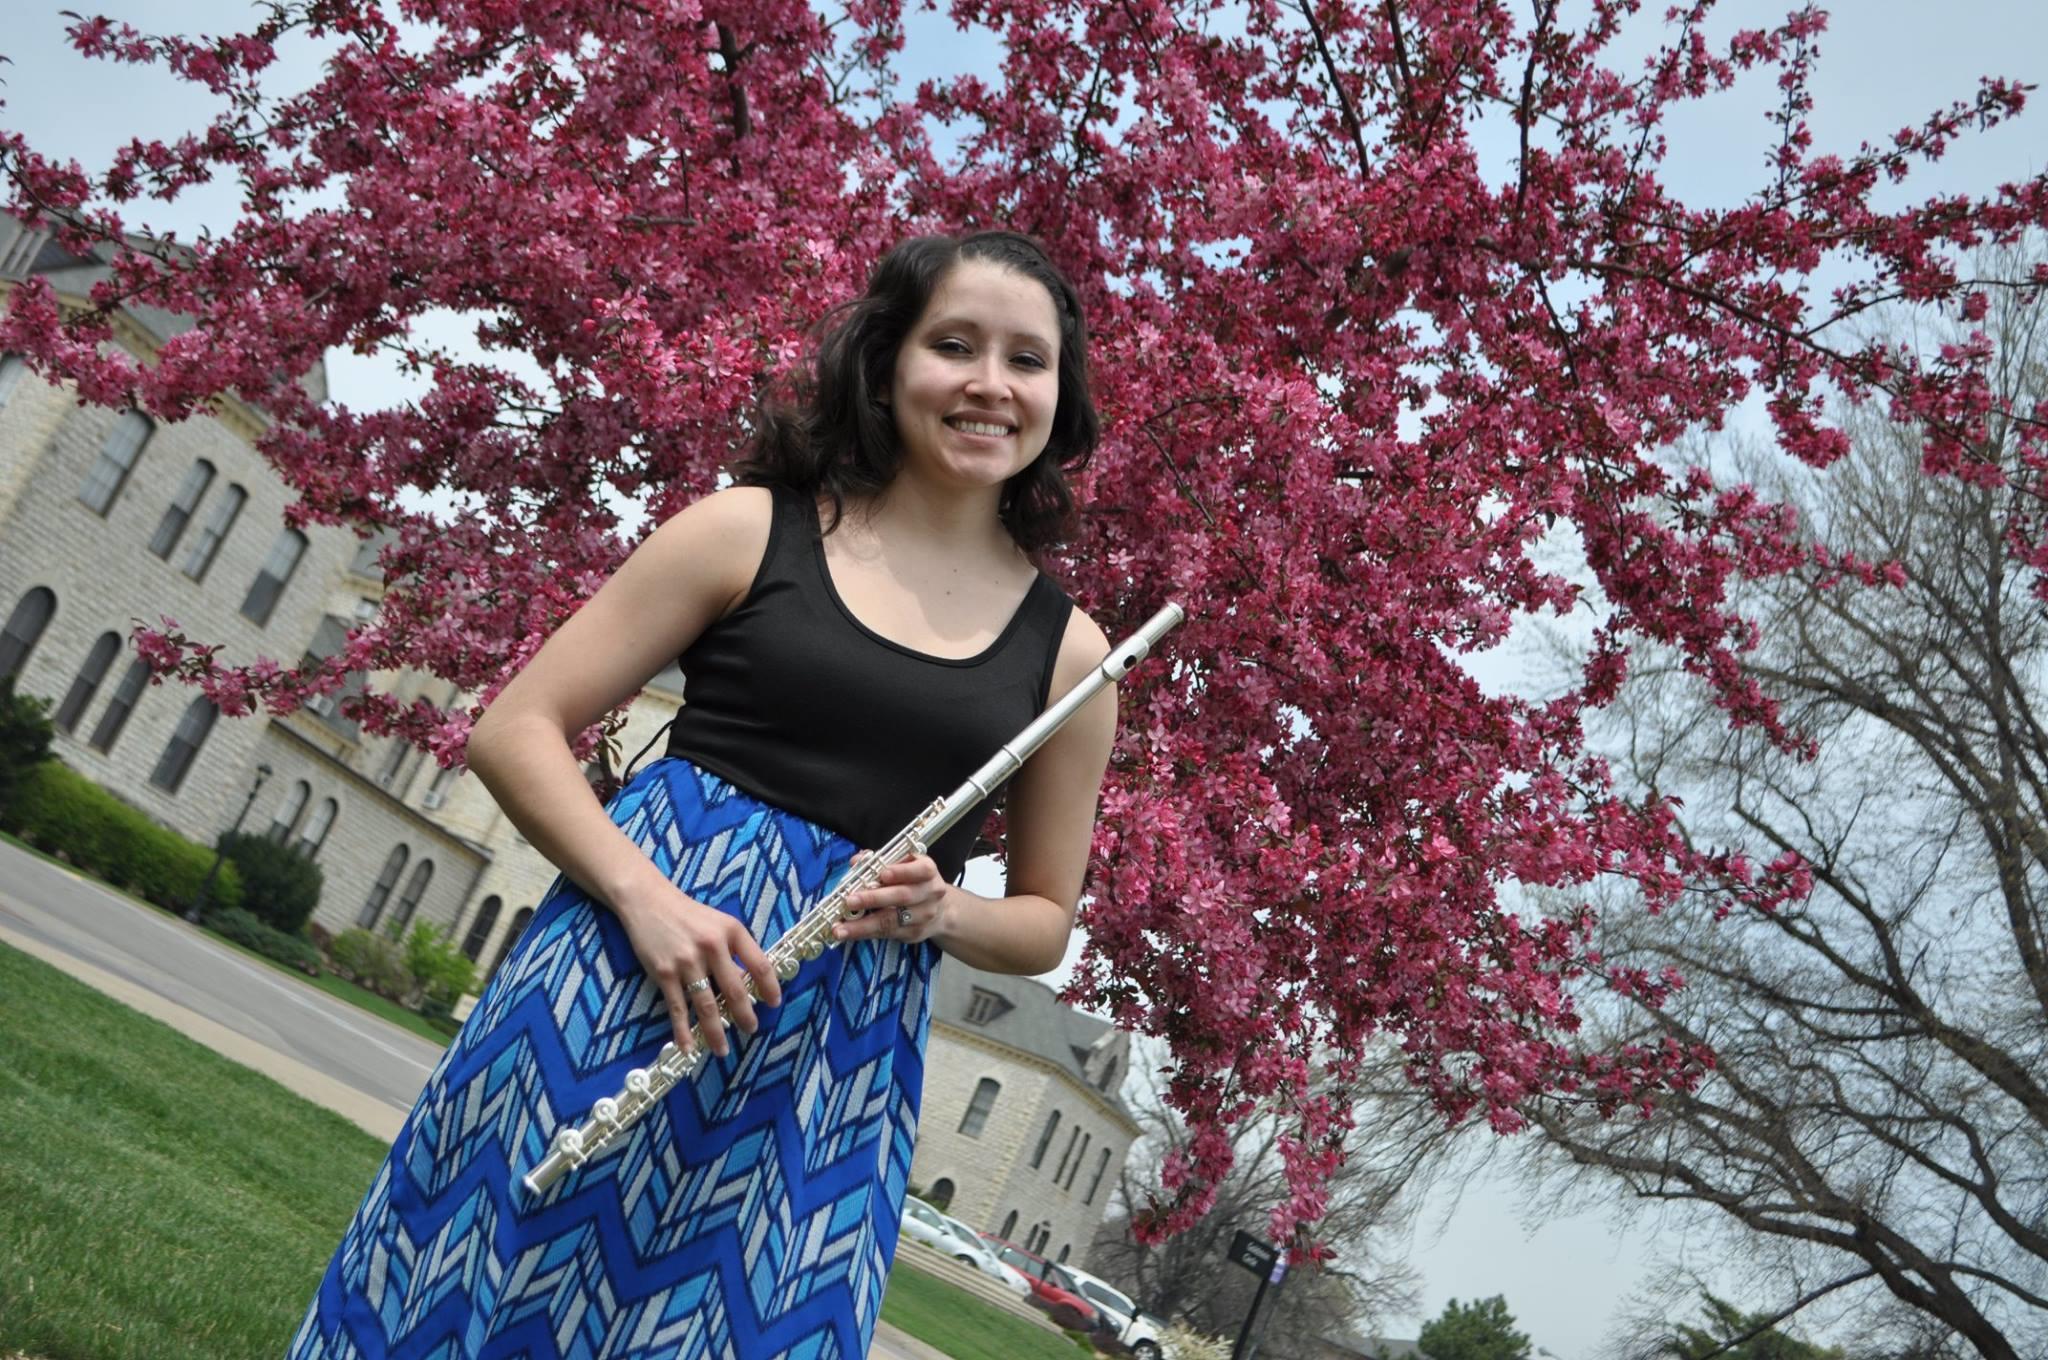 Cuba Music Scholarship winner Marissa Archuleta